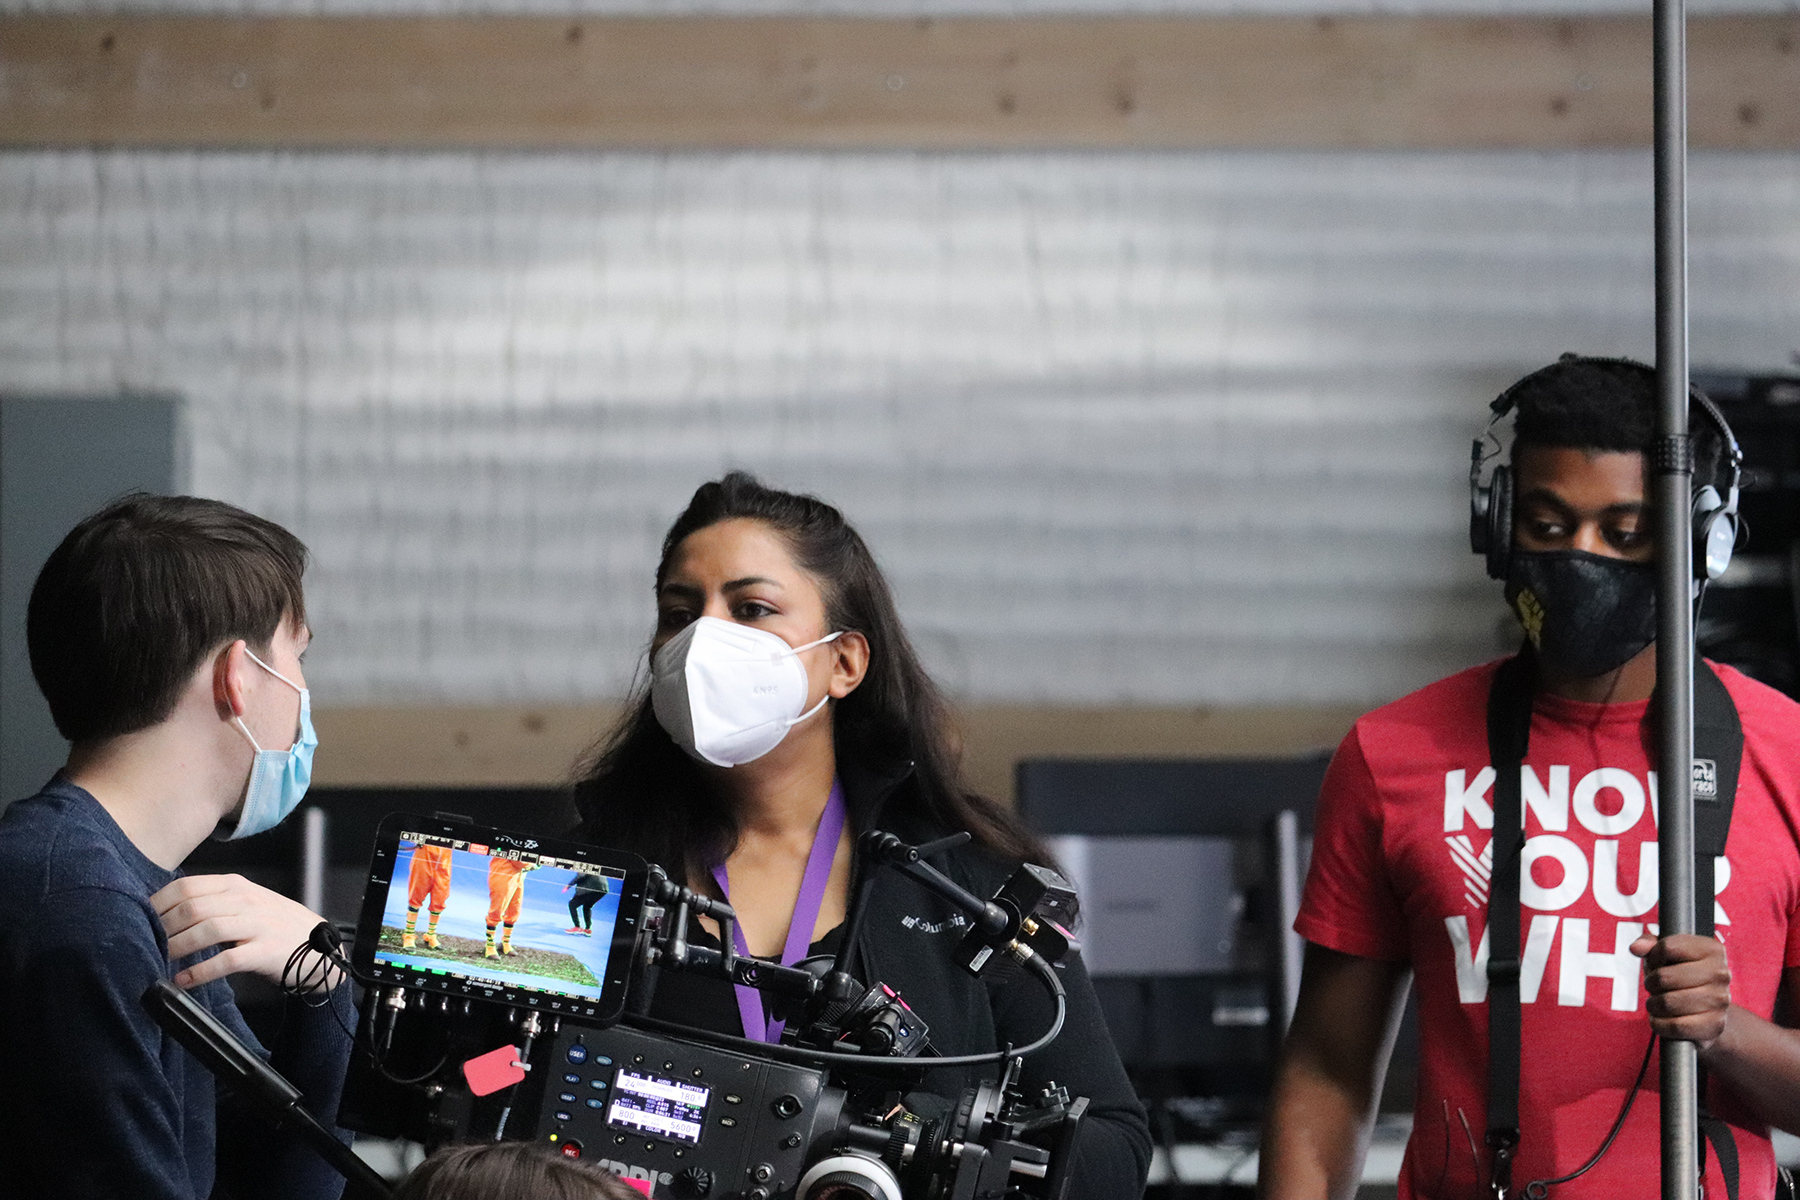 Ambarien Alqadar talks with students on the set.